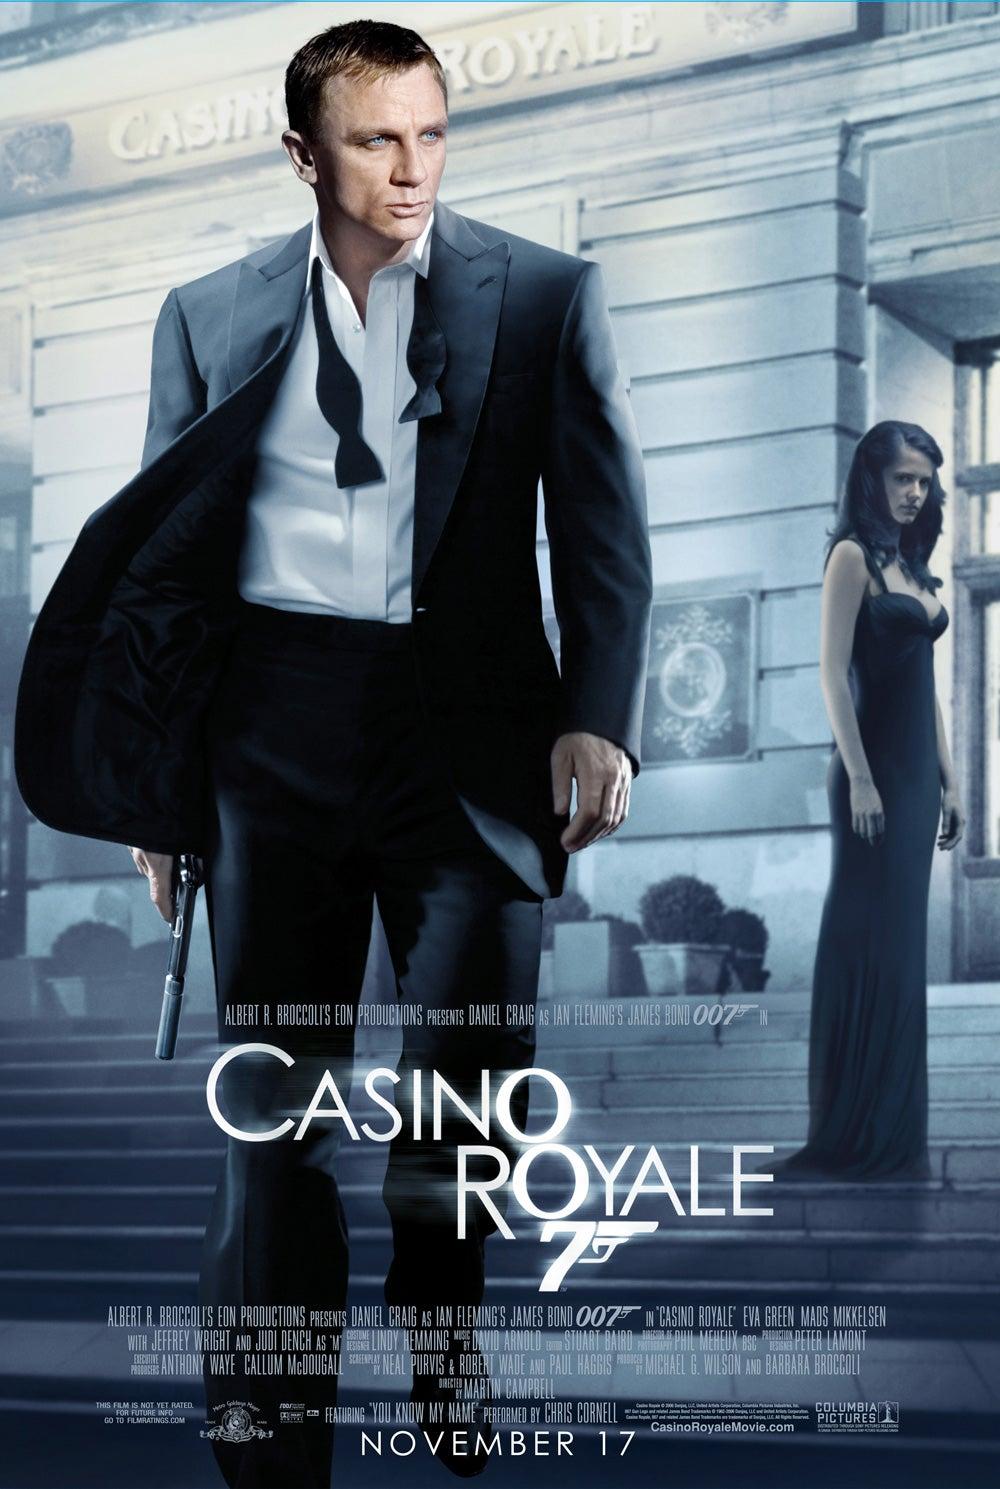 https://i0.wp.com/moviesmedia.ign.com/movies/image/object/055/055899/CR_PRD_CROP.jpg